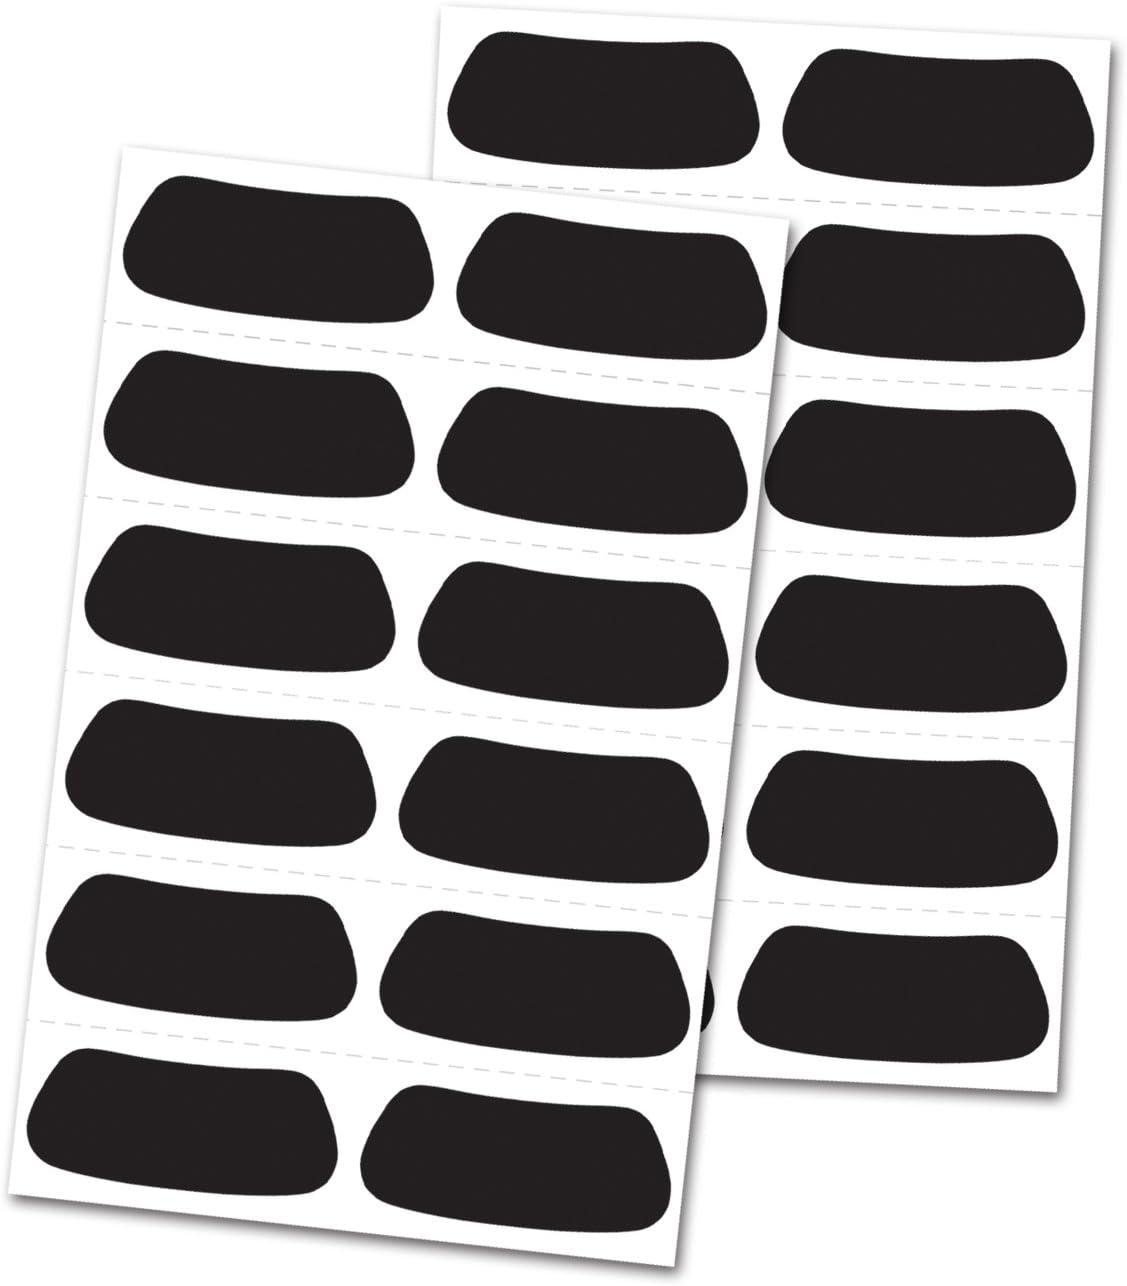 Rawlings Eye Black Stickers - Great for Baseball, Softball, Football, Lacrosse, Sports